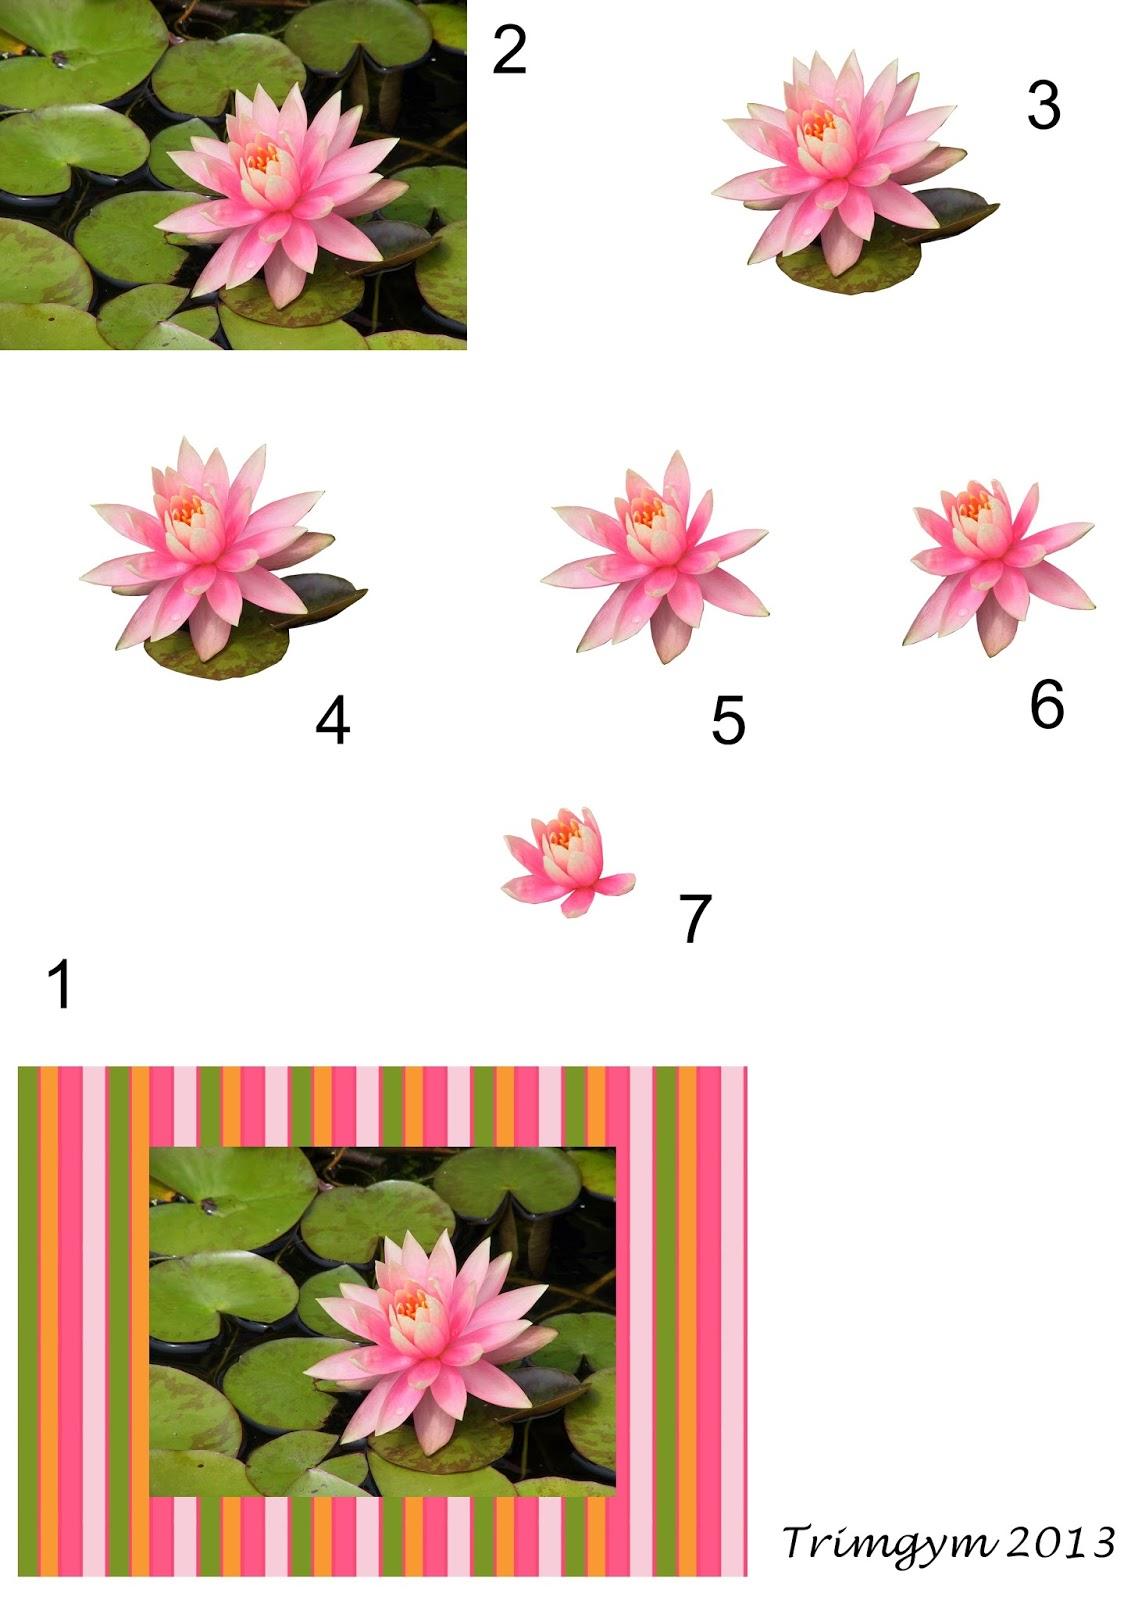 http://4.bp.blogspot.com/-gUmPkAhiwHU/UwUR34CxttI/AAAAAAAASBU/o1gnRtfOfzE/s1600/Waterlily+decoupage+sheet+1+by+Trimgym.jpg